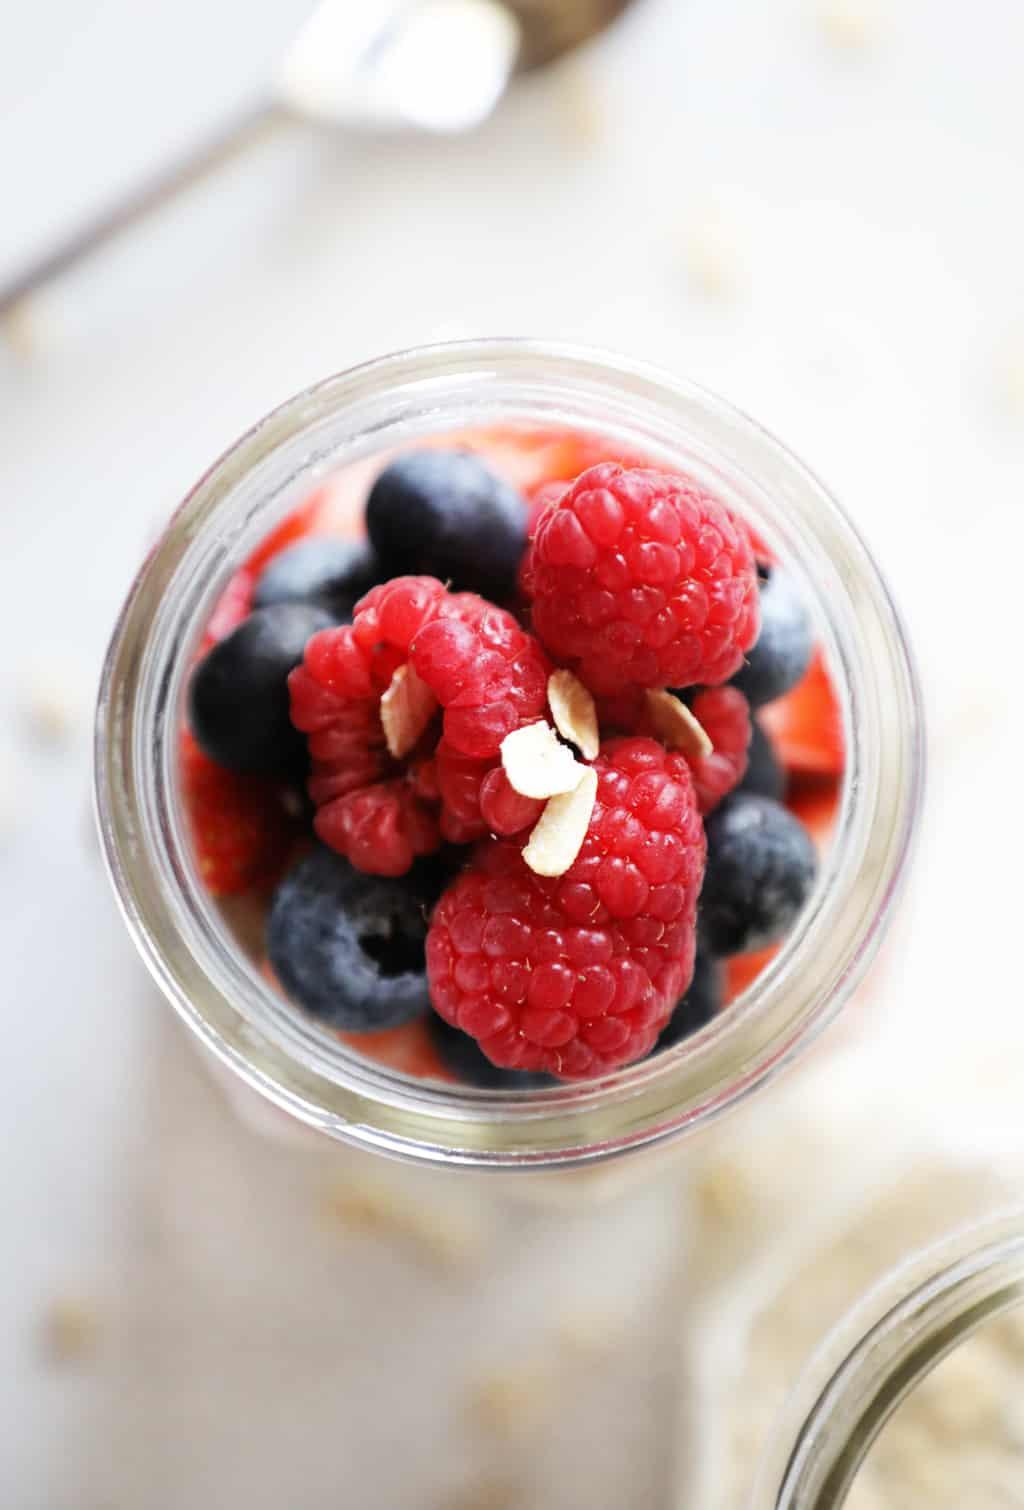 birds eye view of berries in a mason jar